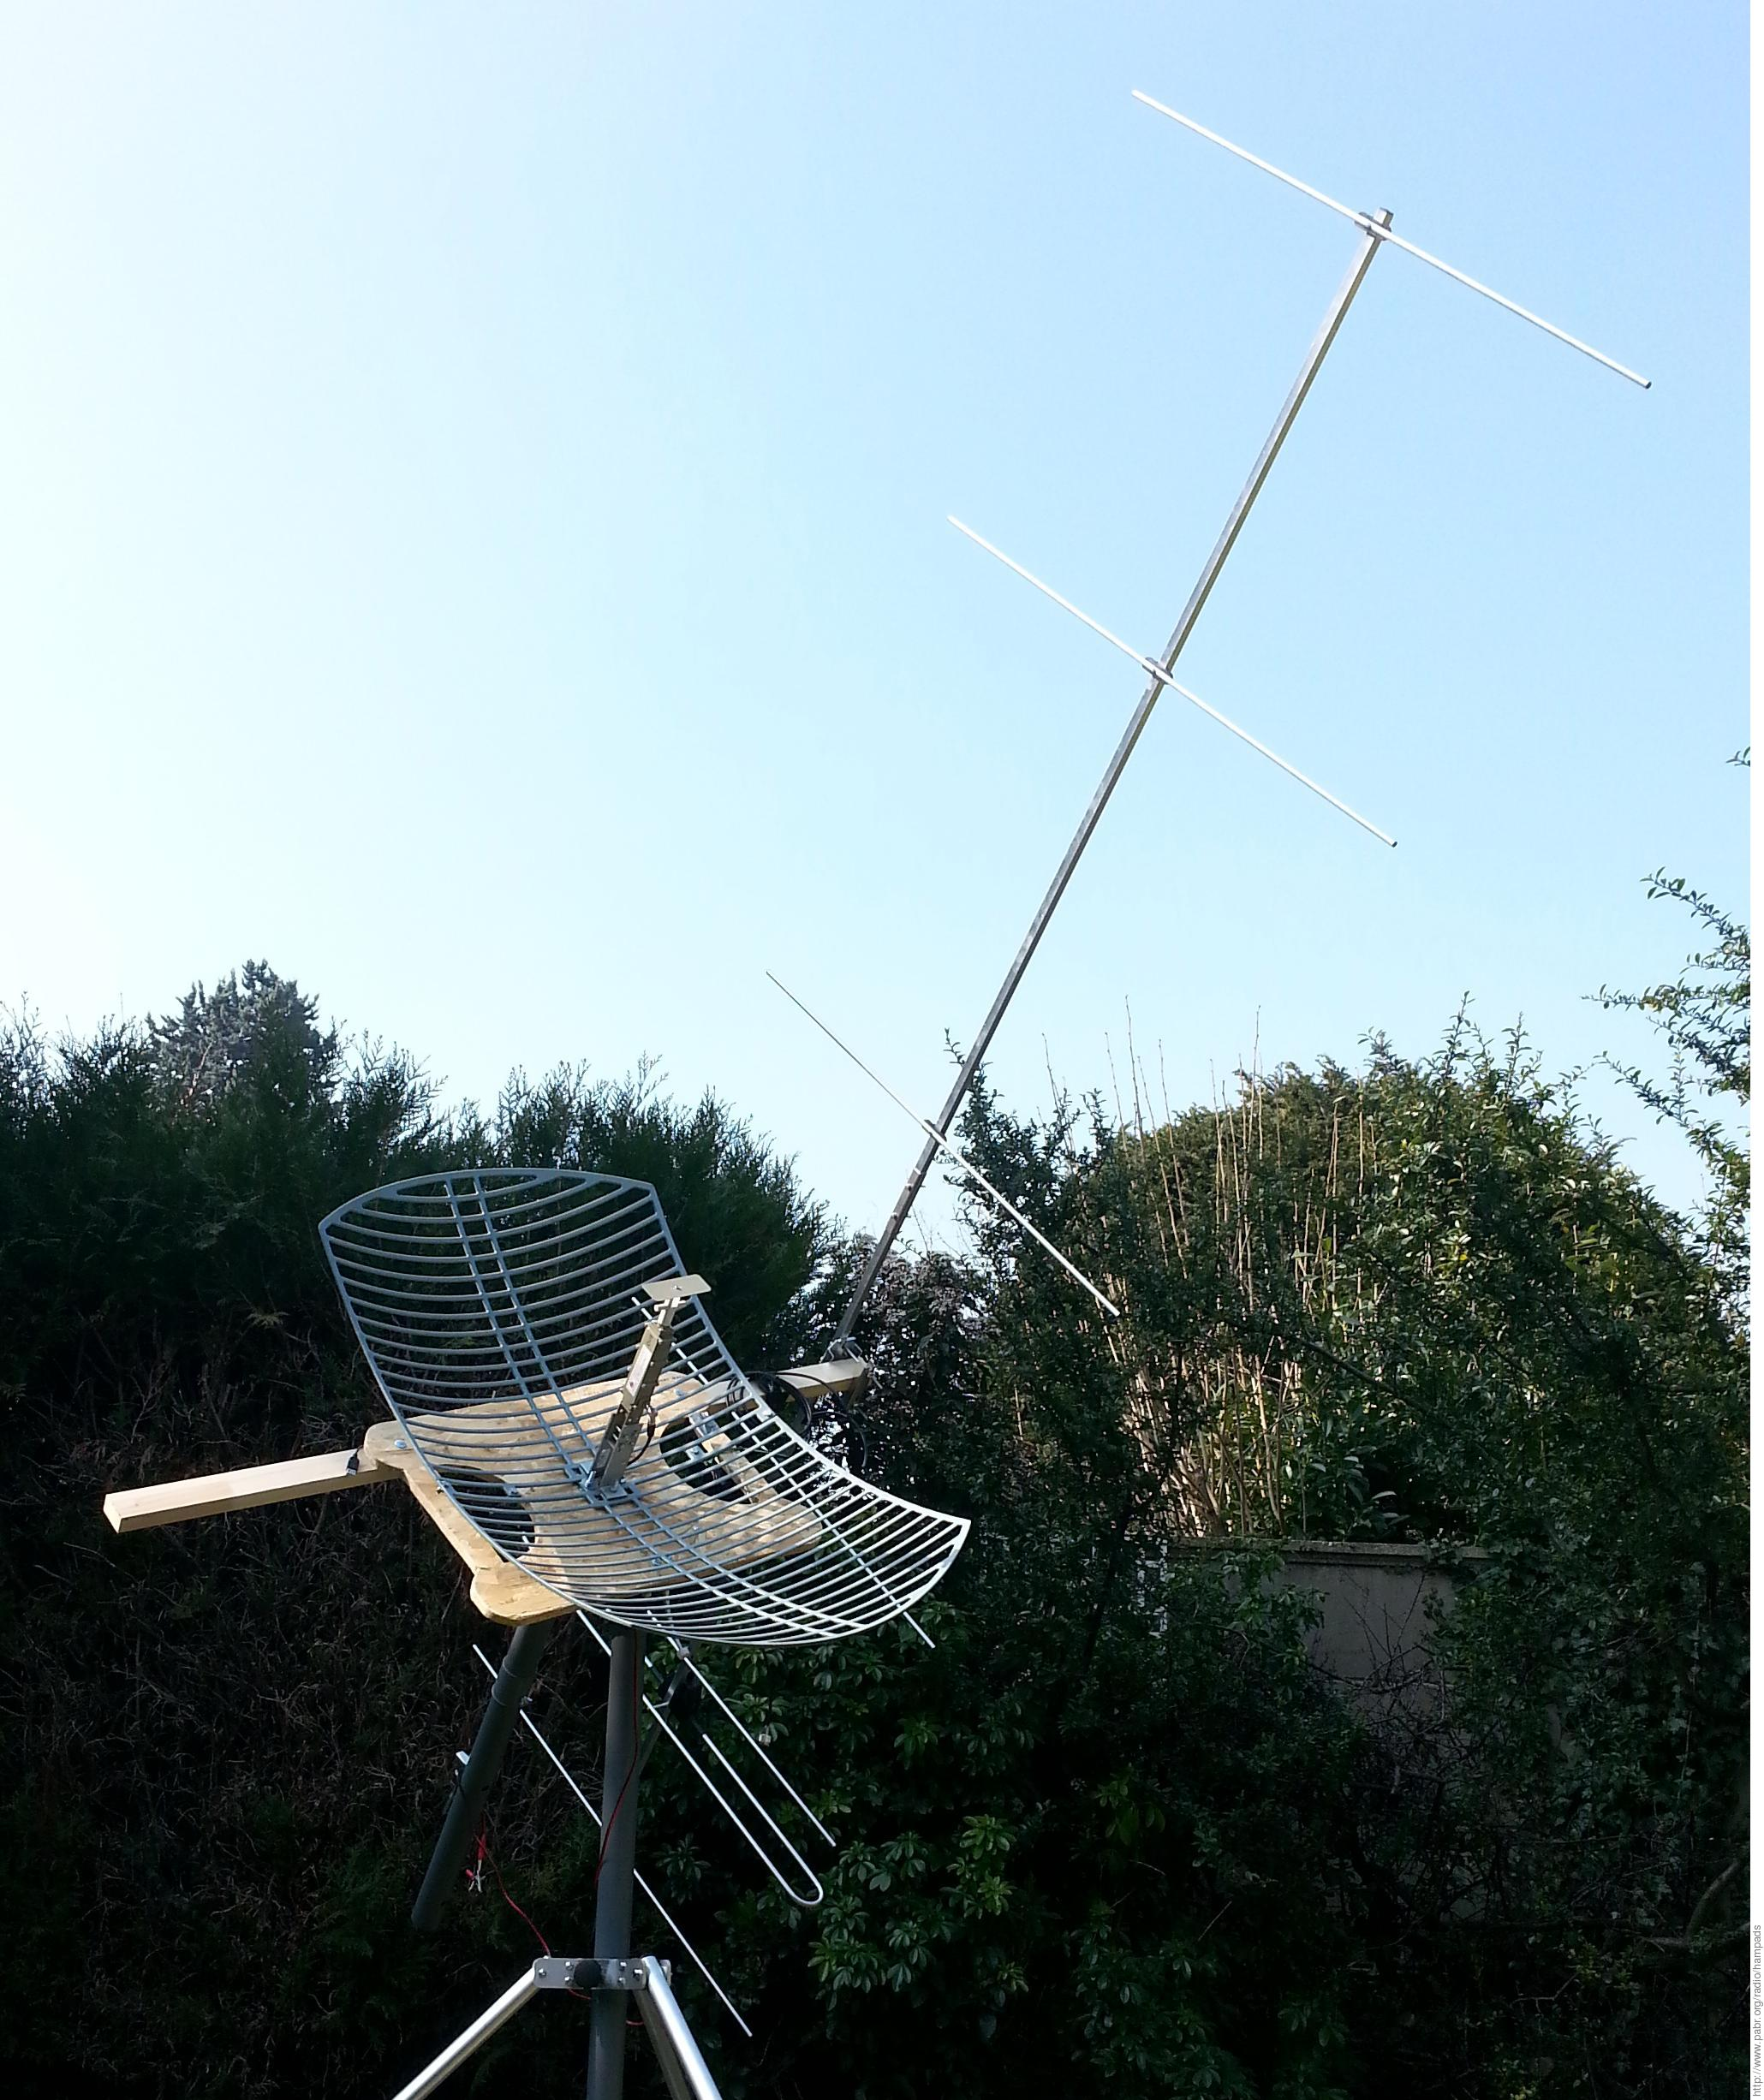 HAMPADS: HAM-Portable Affordable Dish for Satellites